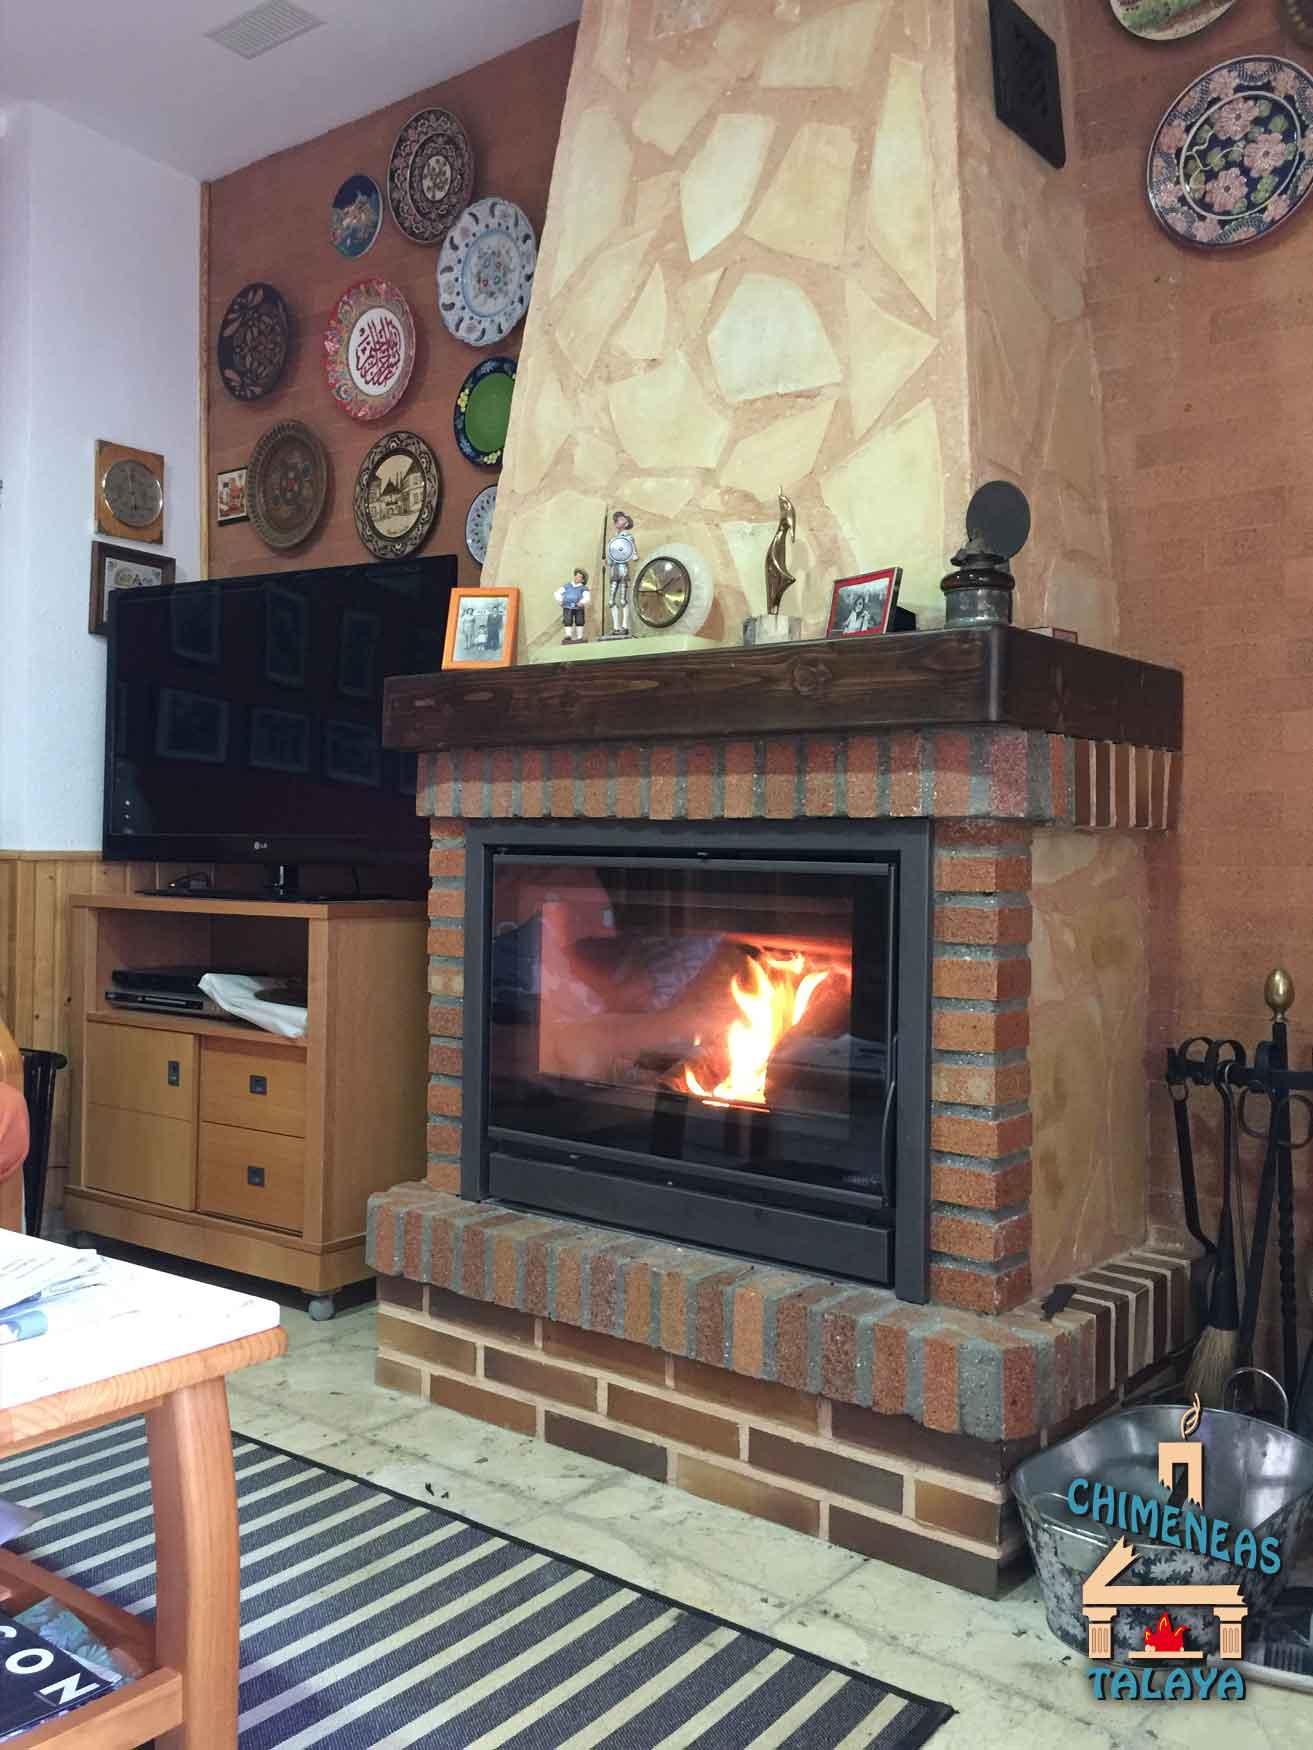 Chimeneas abiertas sistemas de calefacci n biomasa - Chimeneas de pelets ...